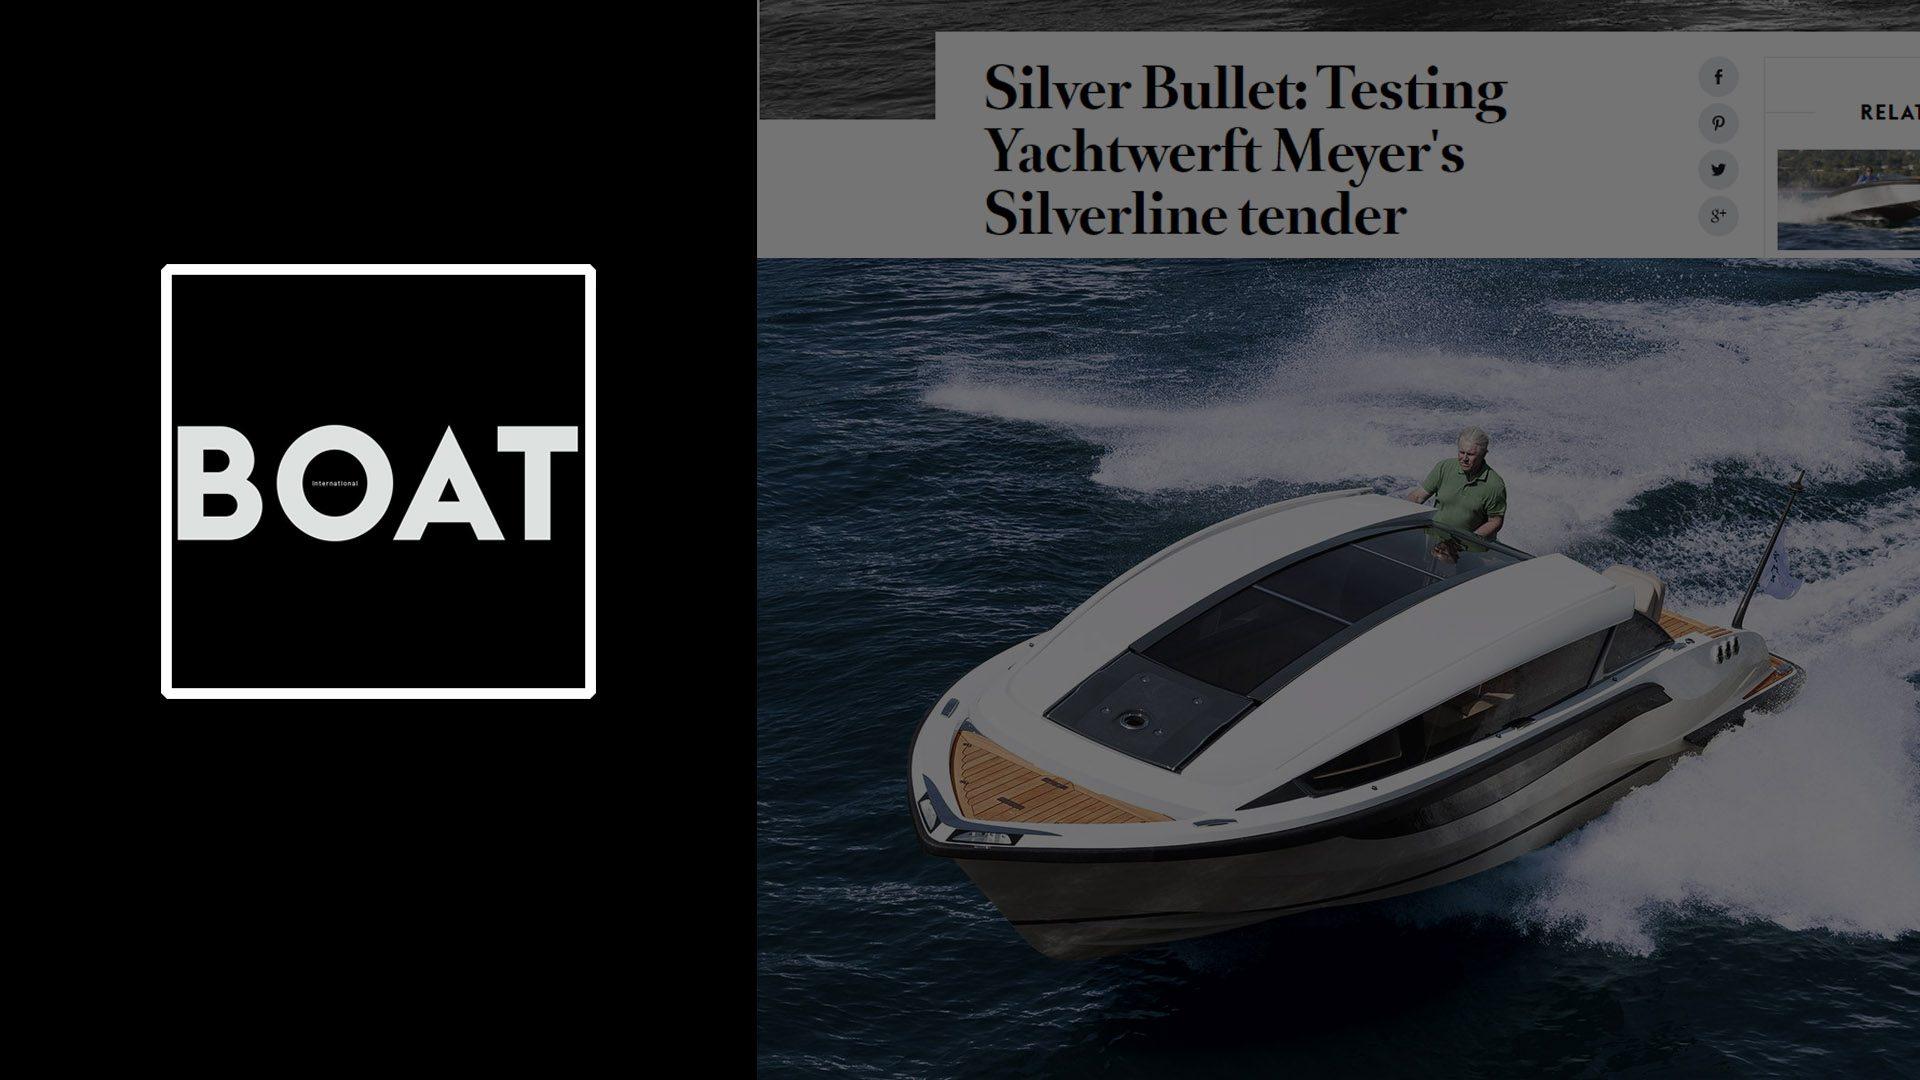 Superyacht limousine tender Silverline designed by Hamid Bekradi featured on BOAT International magazine